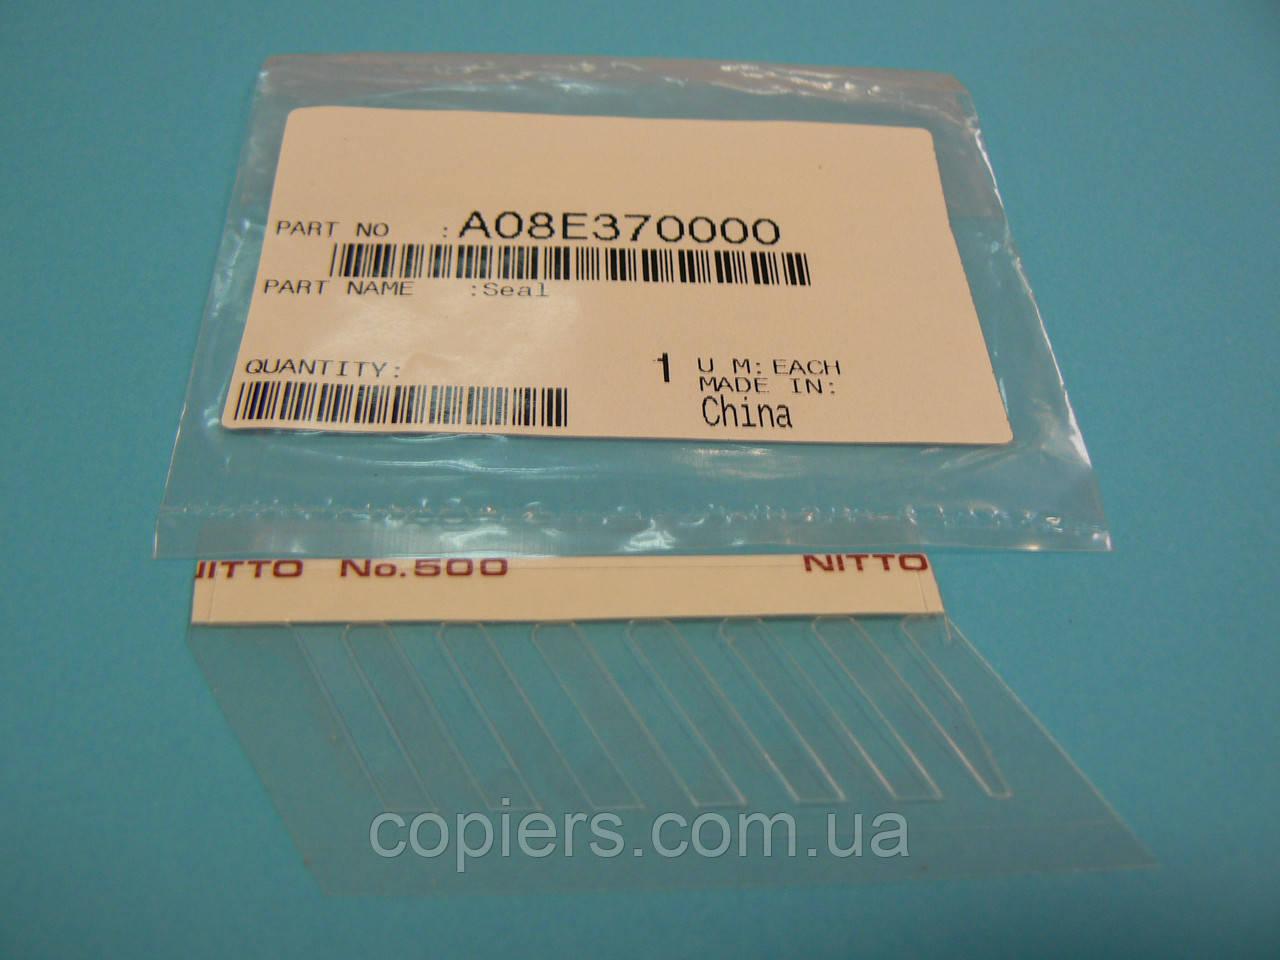 Toner Auger Seal  Bizhub 162 163 оригинал, A08E370000